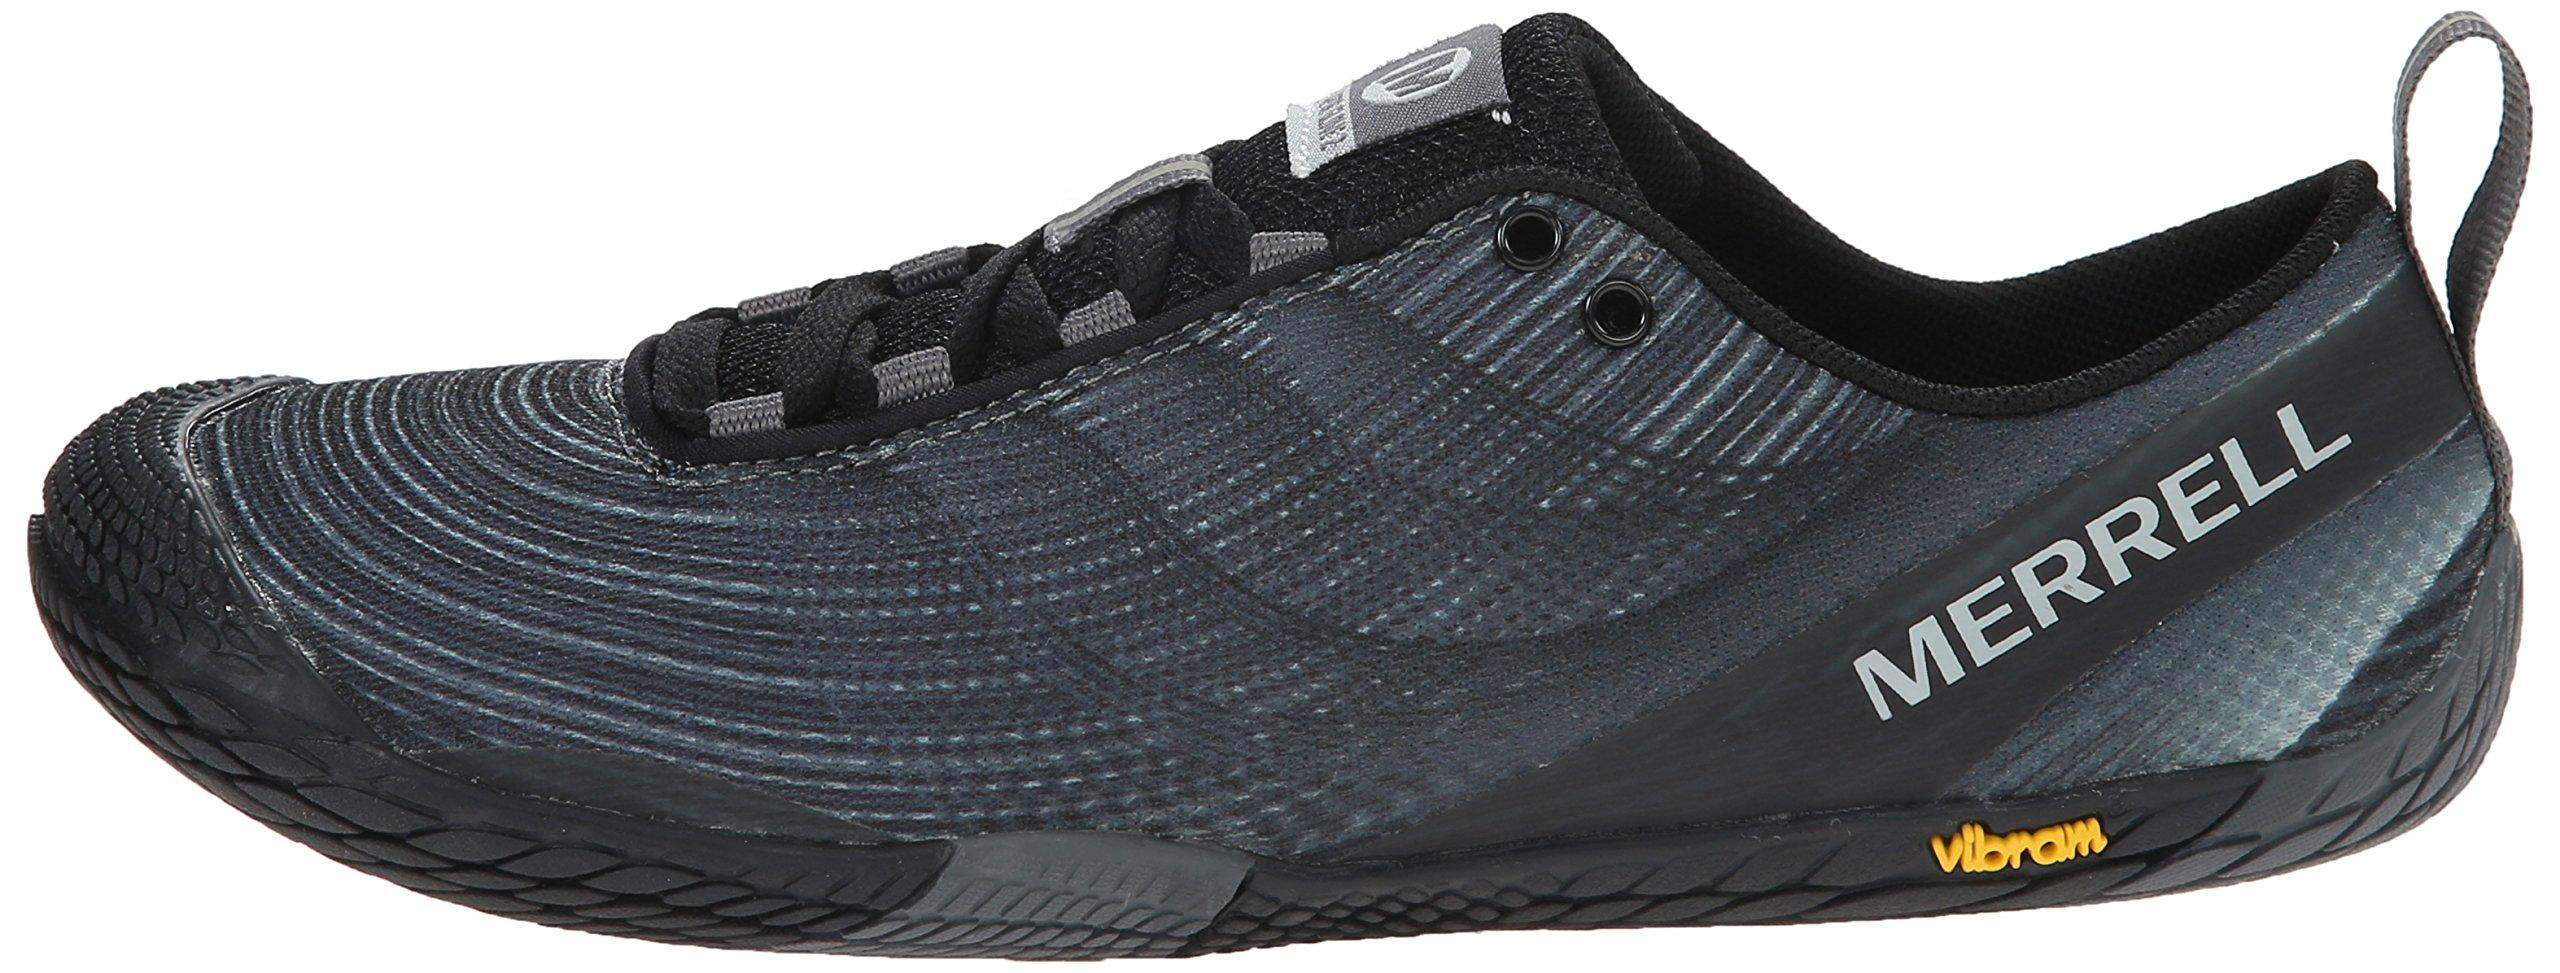 Merrell Women's Vapor Glove 2 Trail Running Shoe, Black/Castle Rock, 6 M US by Merrell (Image #5)